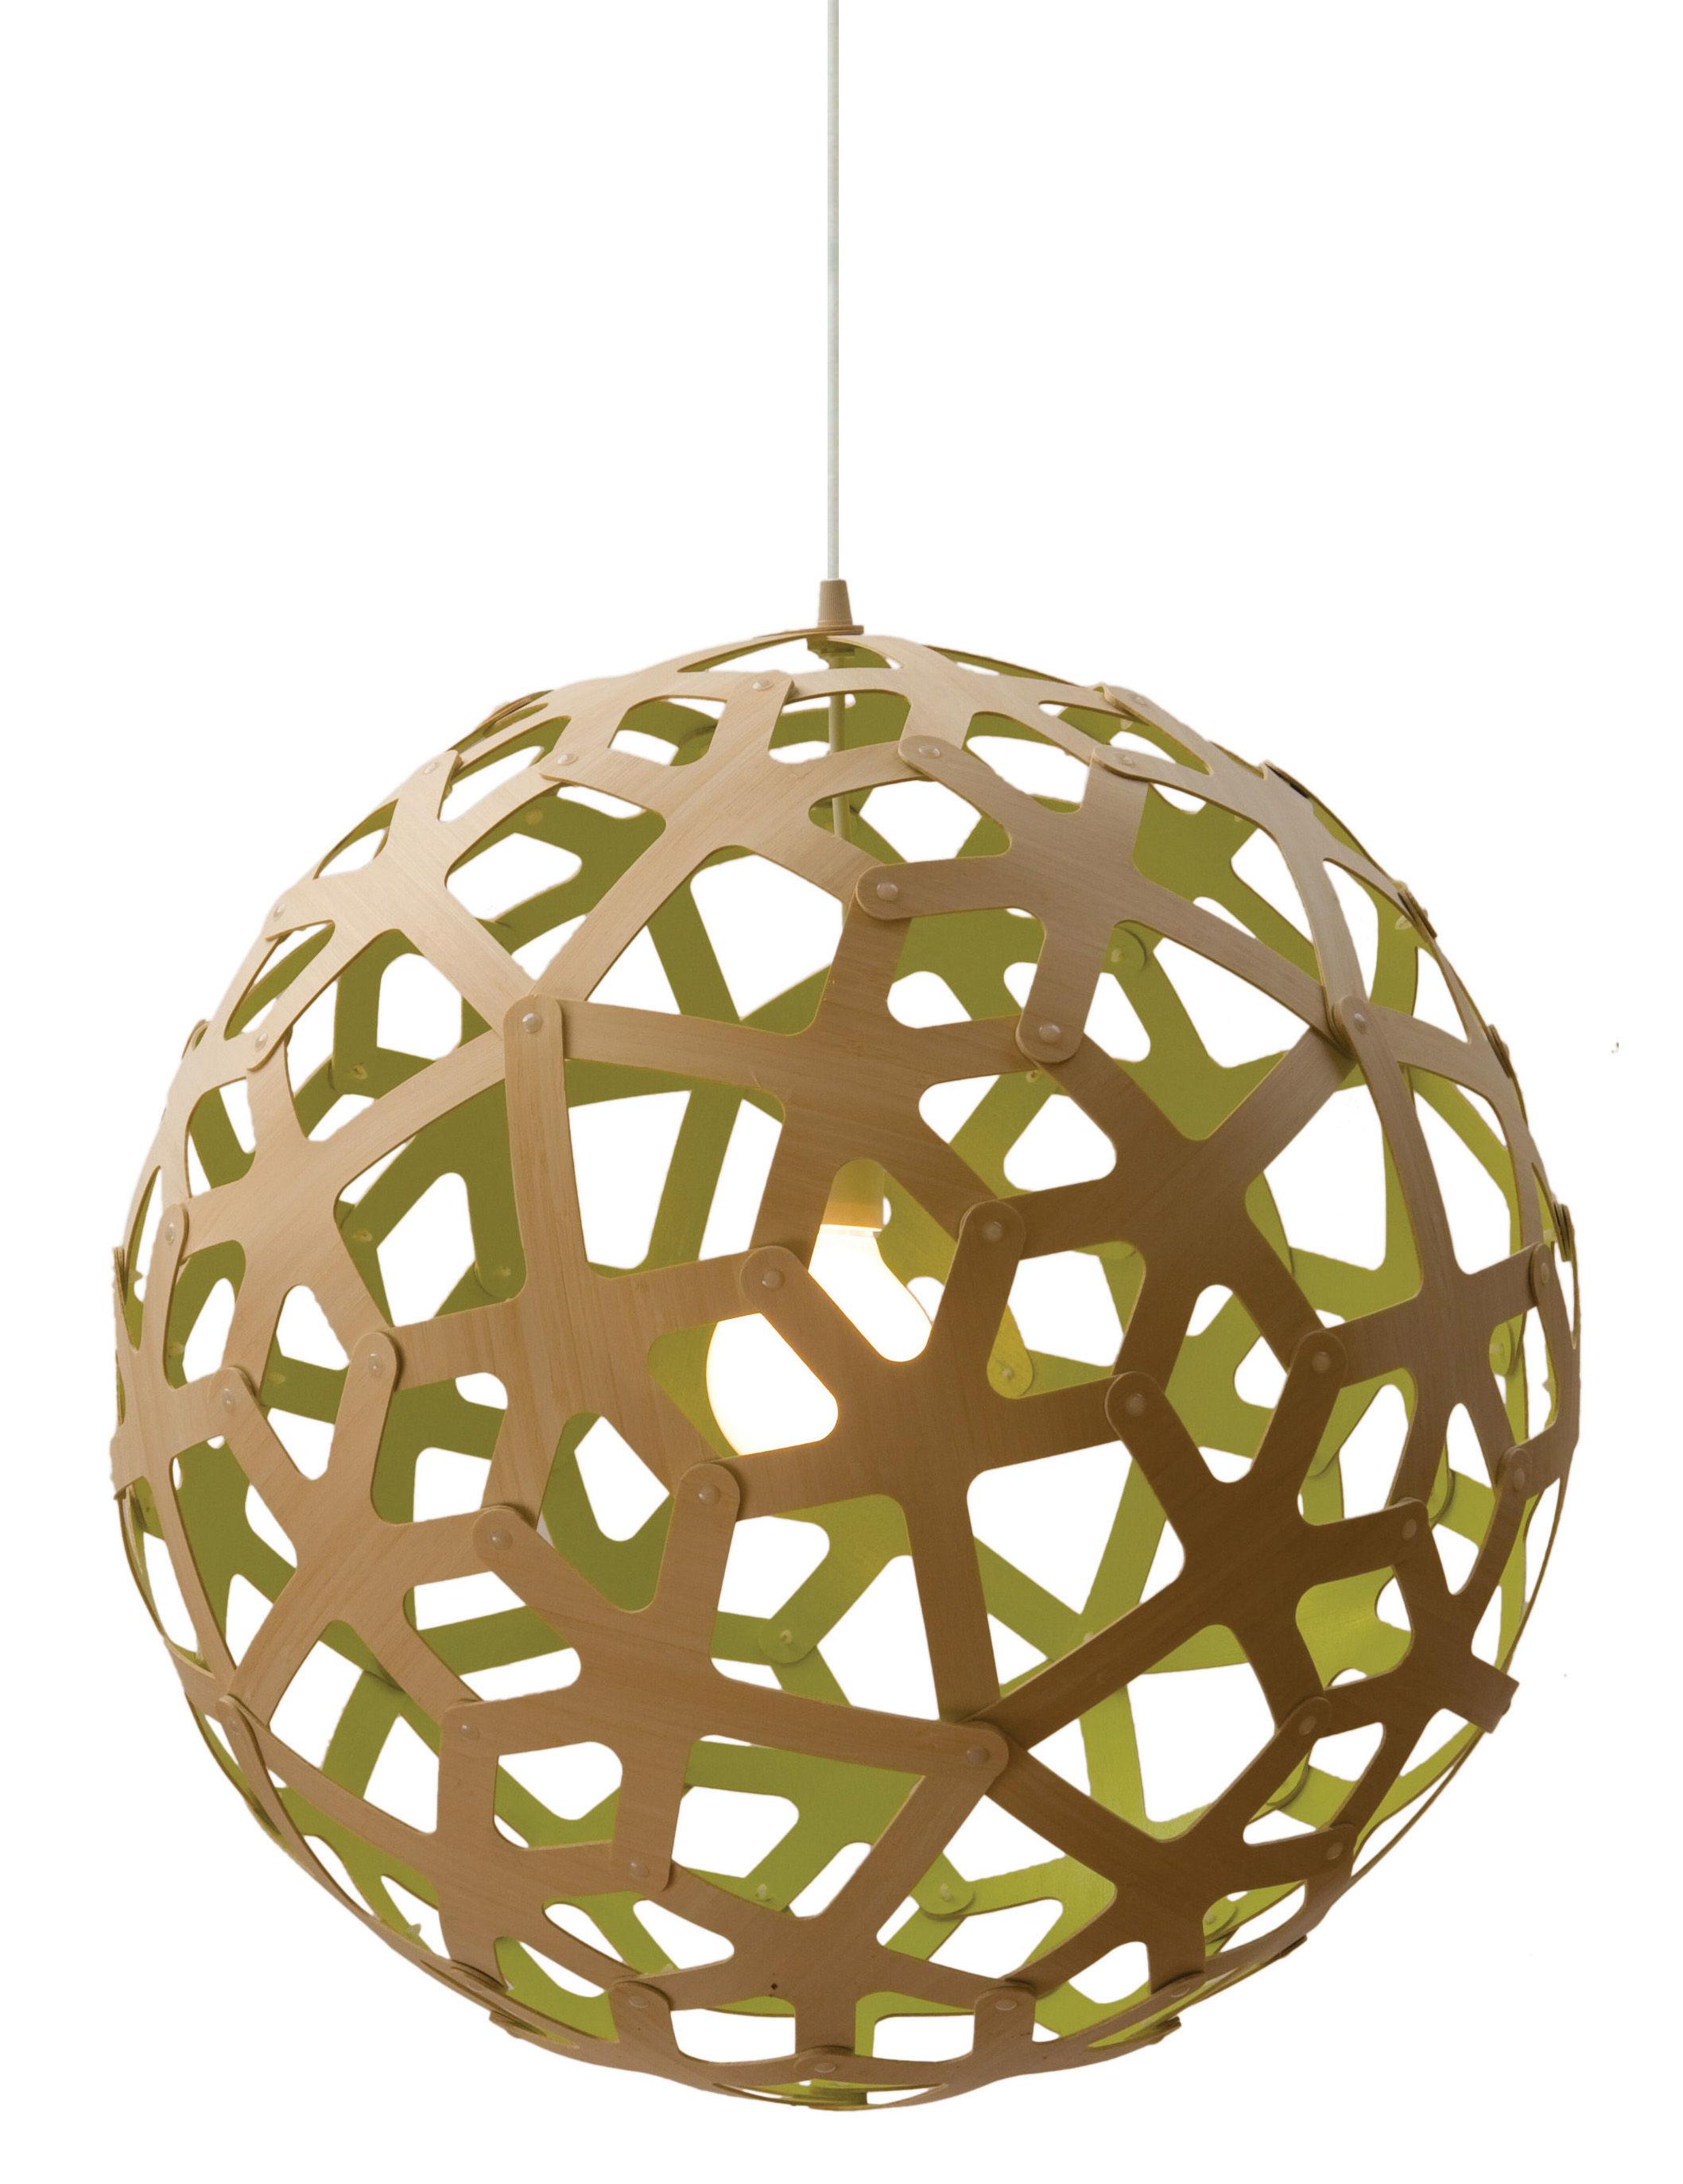 Luminaire - Suspensions - Suspension Coral / Ø 60 cm - Bicolore vert citron & bois - David Trubridge - Vert citron / Bois naturel - Pin